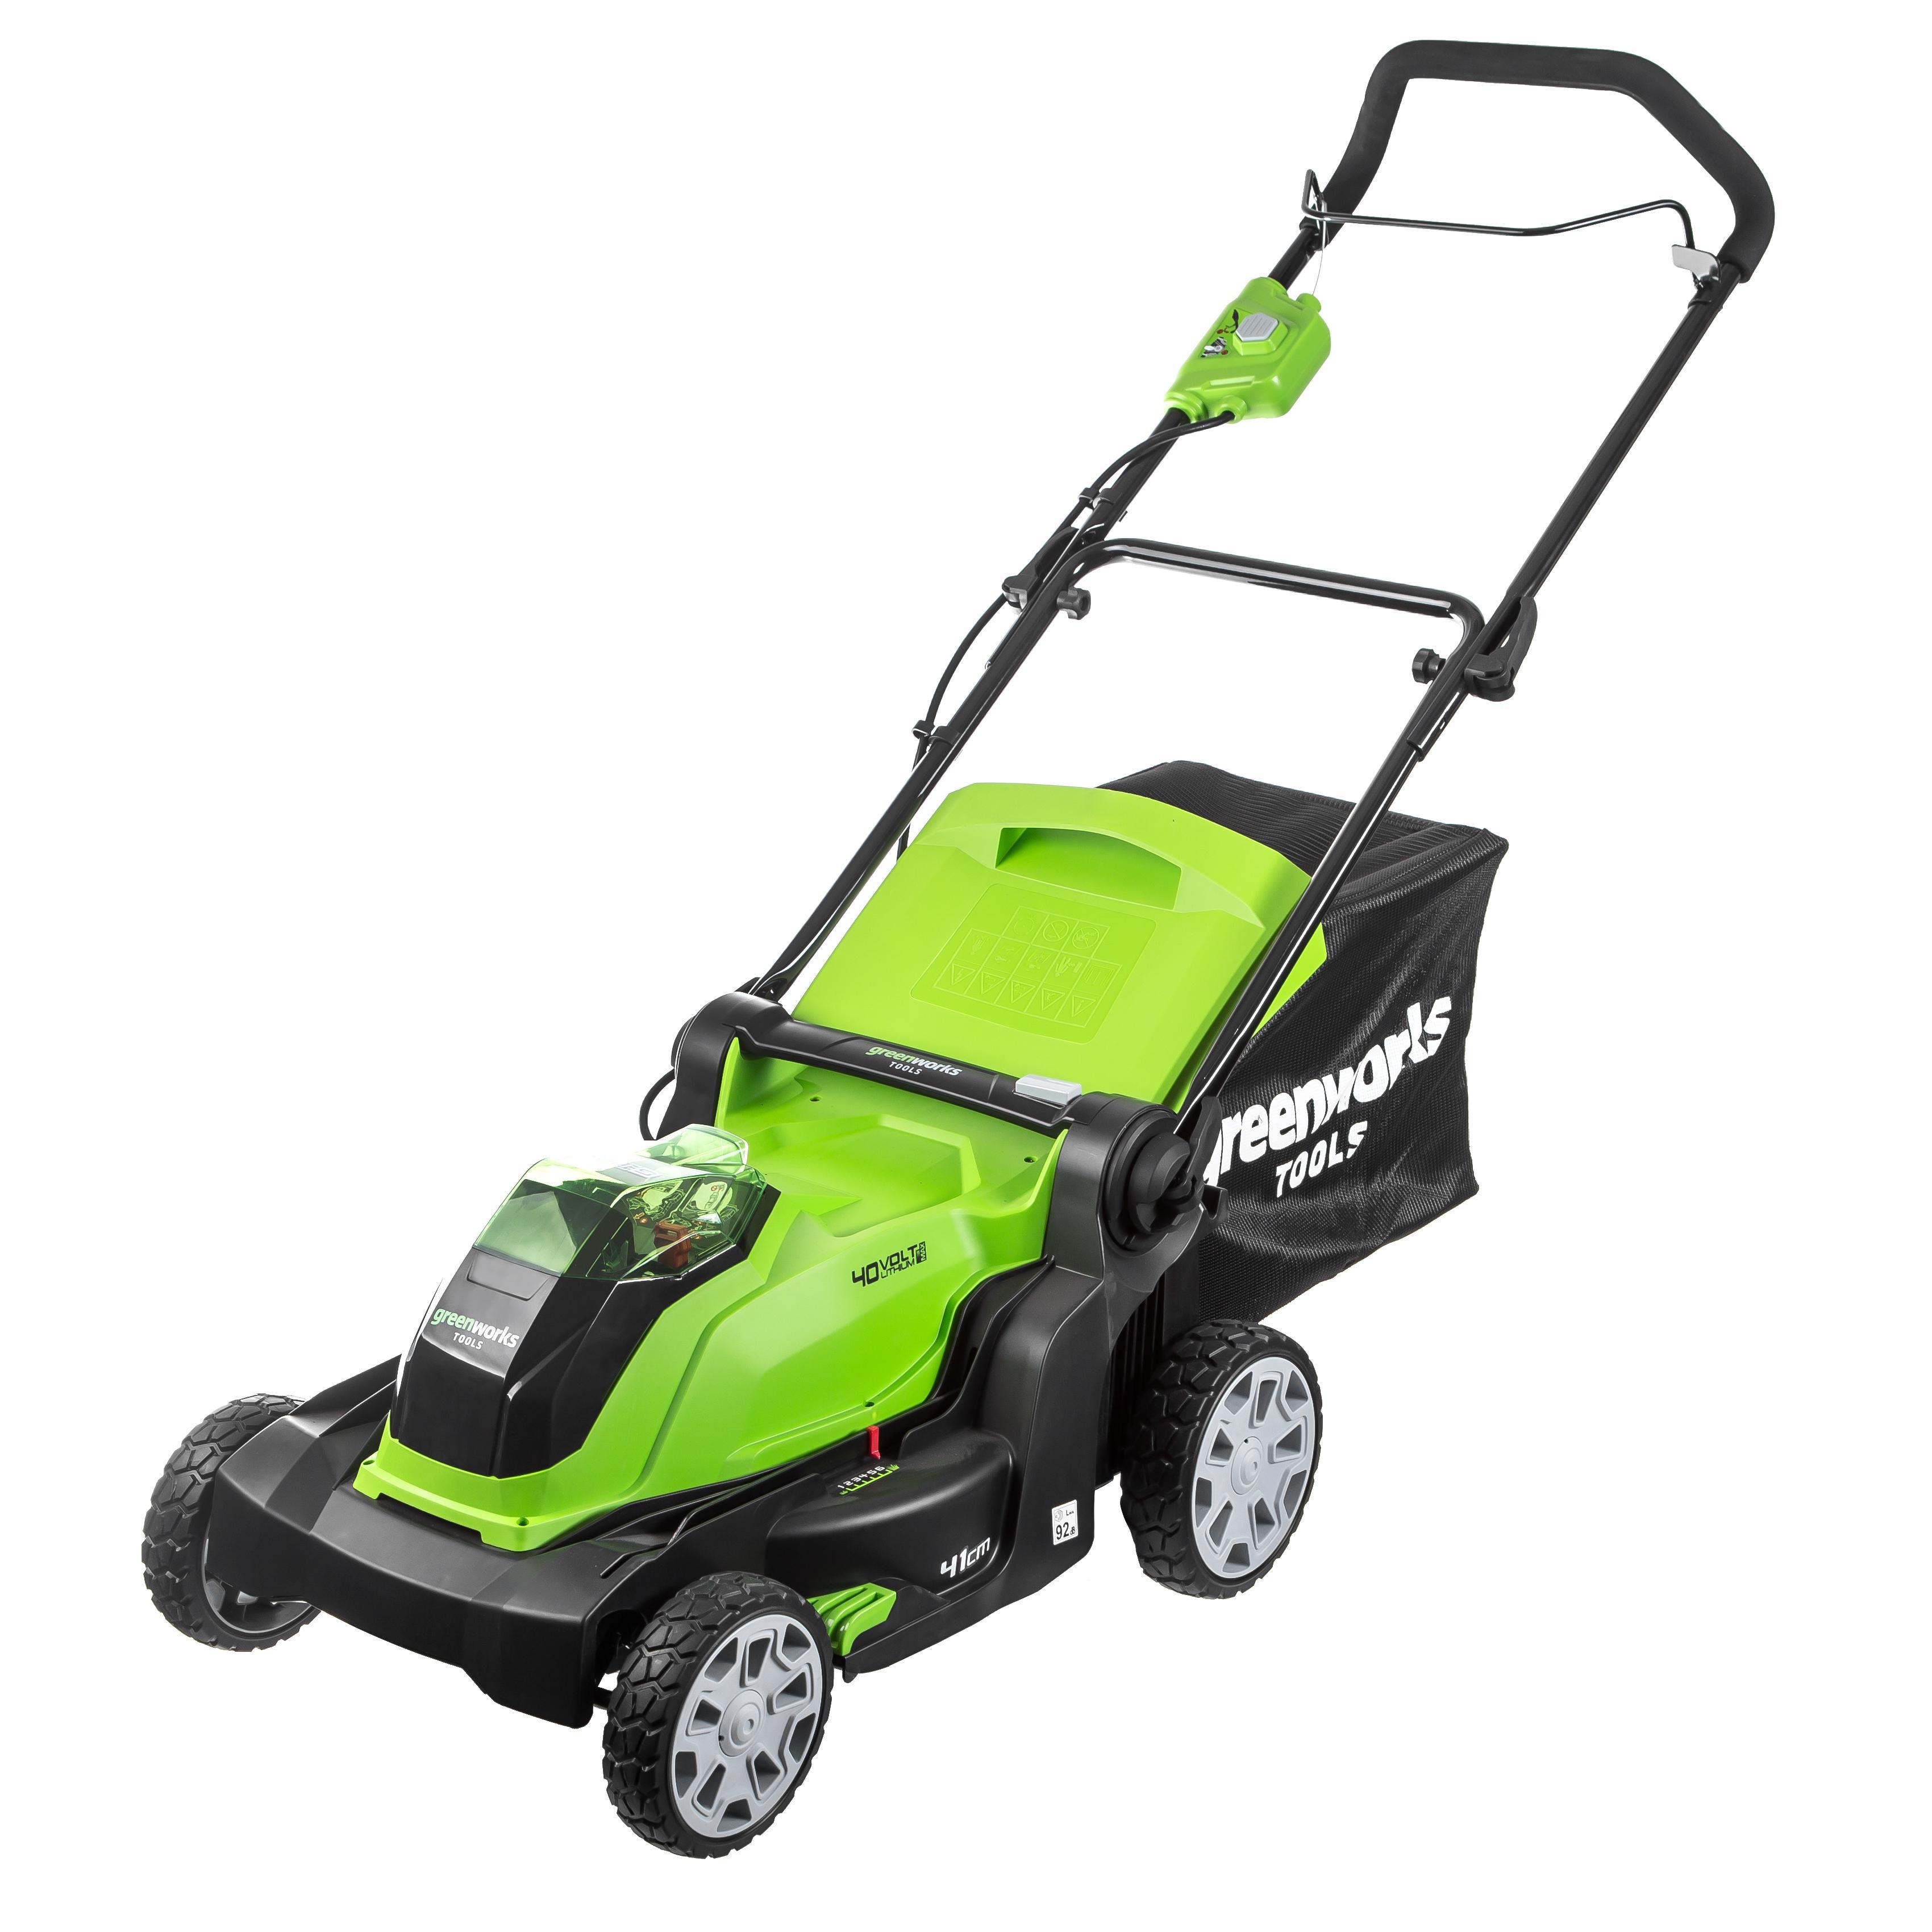 Аккумуляторная газонокосилка Greenworks G40lm40 (2504707) БЕЗ АКК. и ЗУ дрель шуруповерт greenworks gd24bd 3701607 без аккум и зу